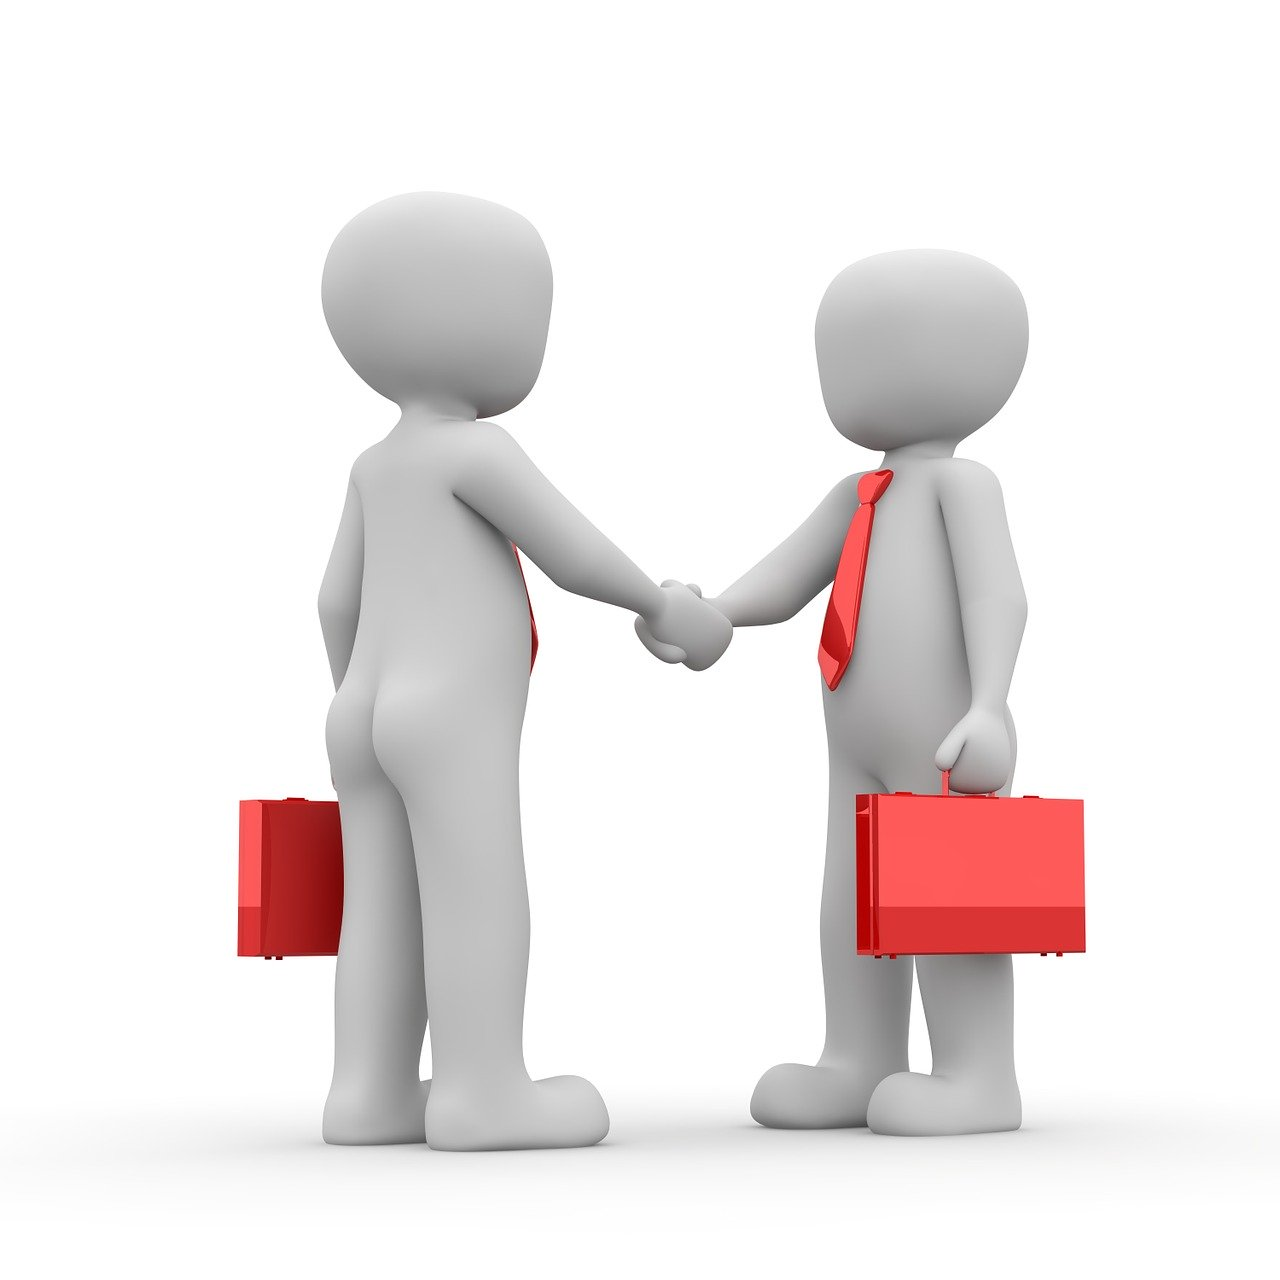 shops, partnership, cooperation